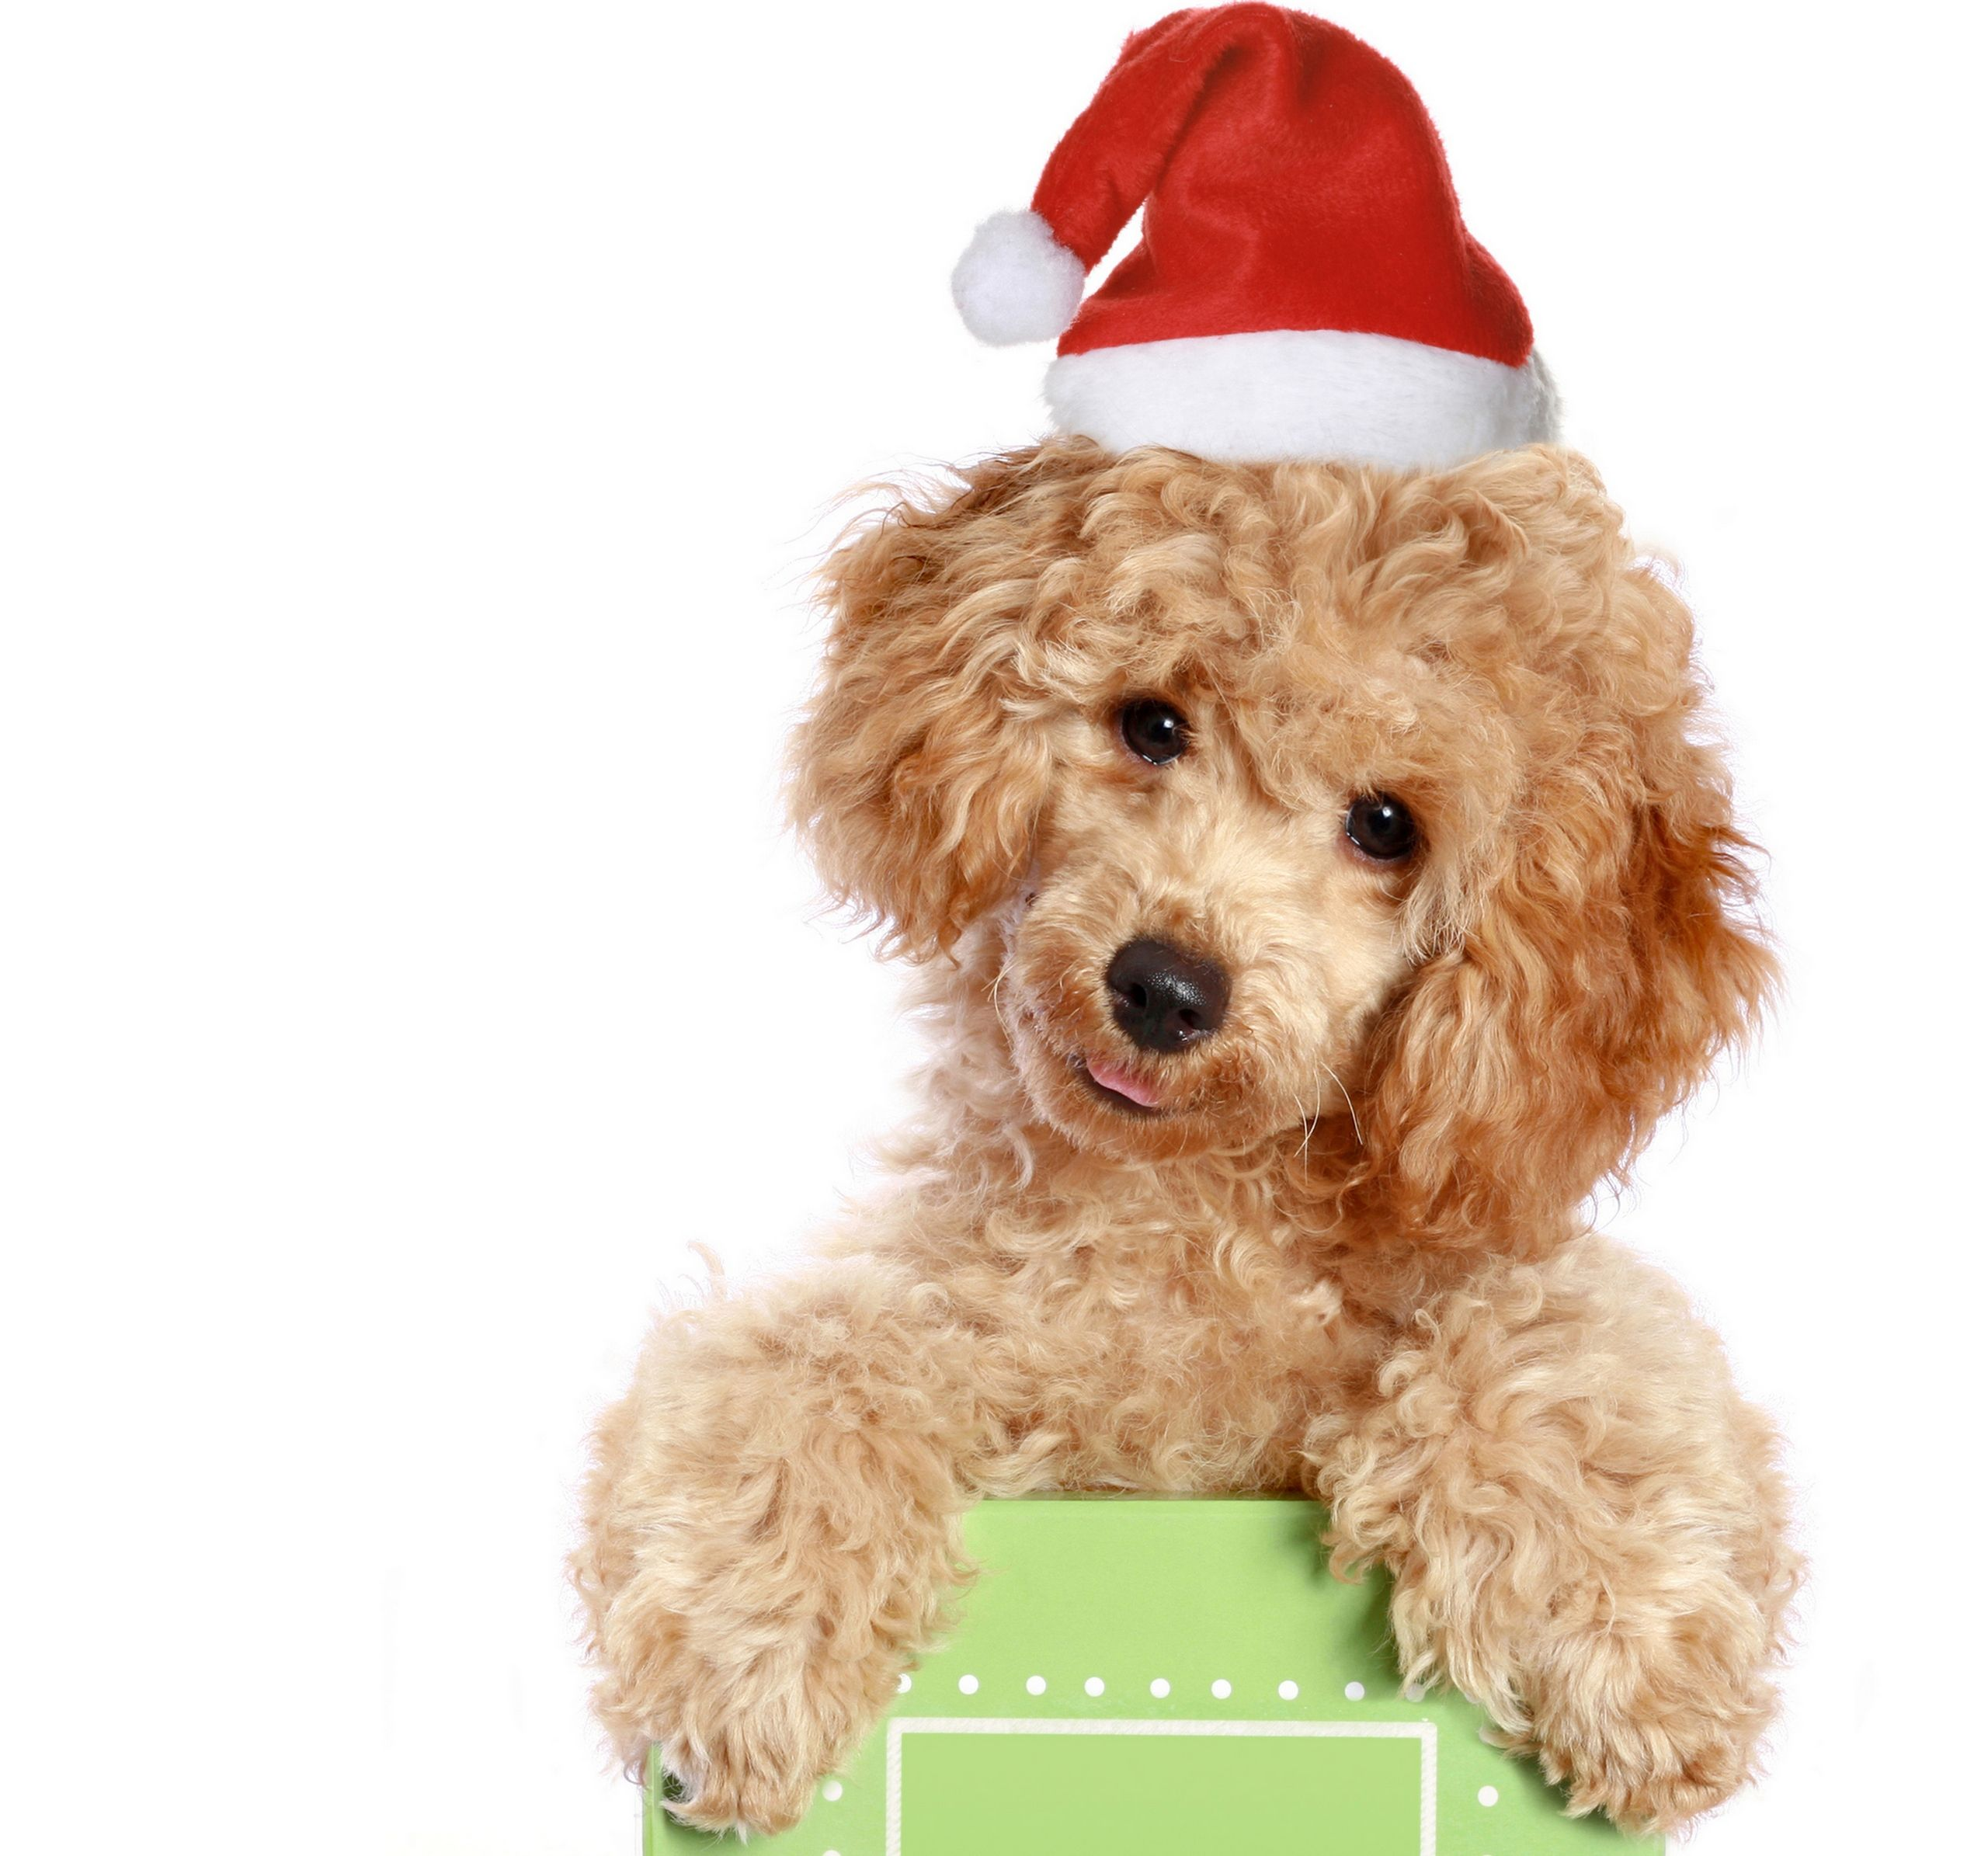 santa hat on cute dog Christmas dog, Christmas animals